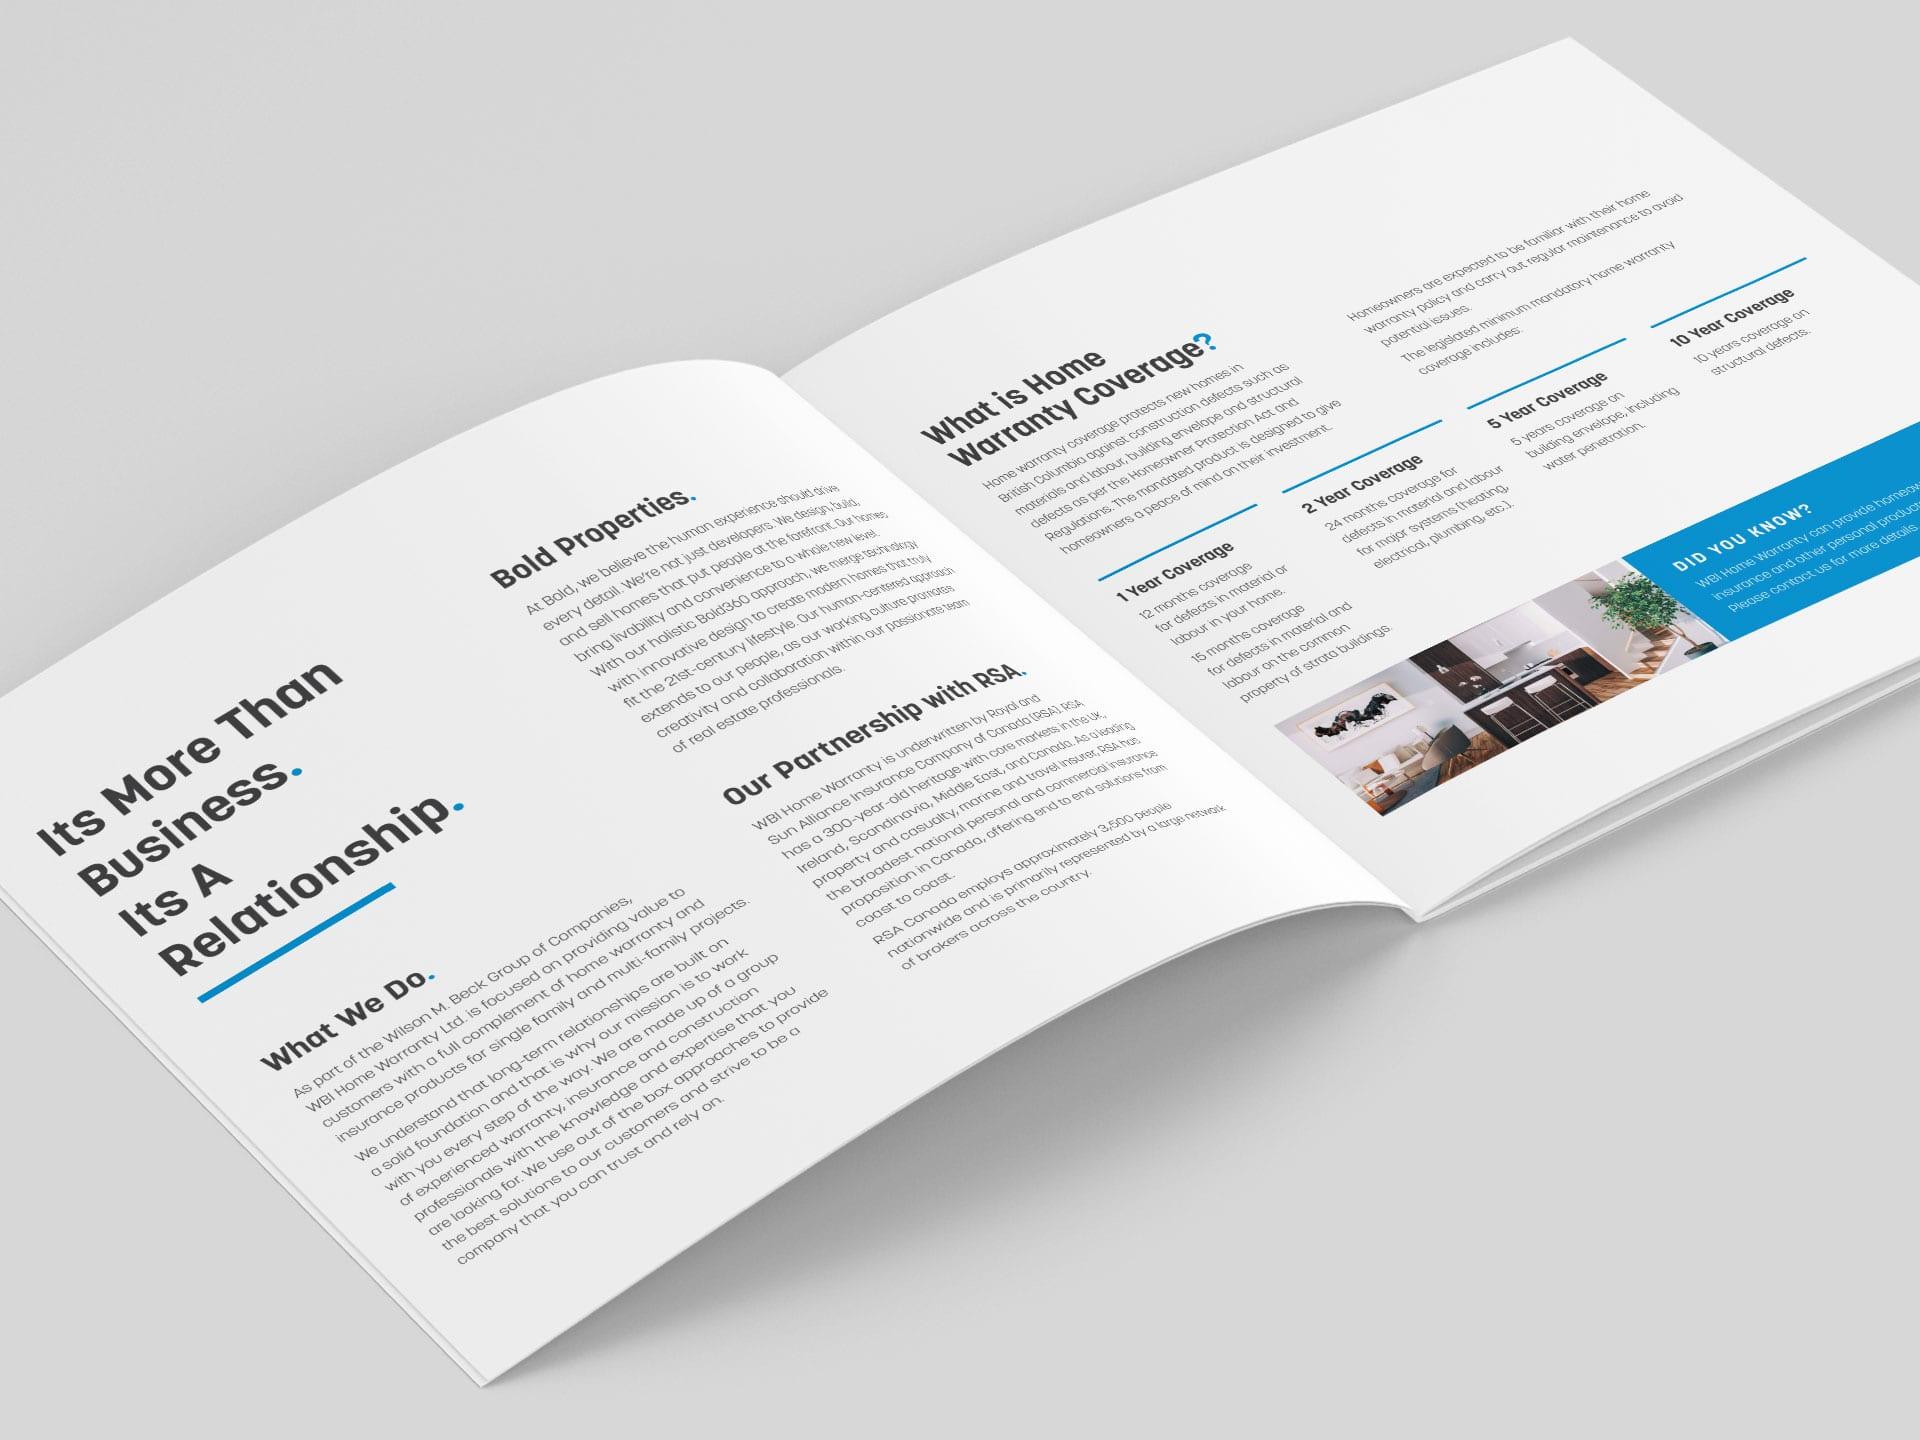 Y5 Creative Case Studies WBI Home Warranty Brochure 1 2019